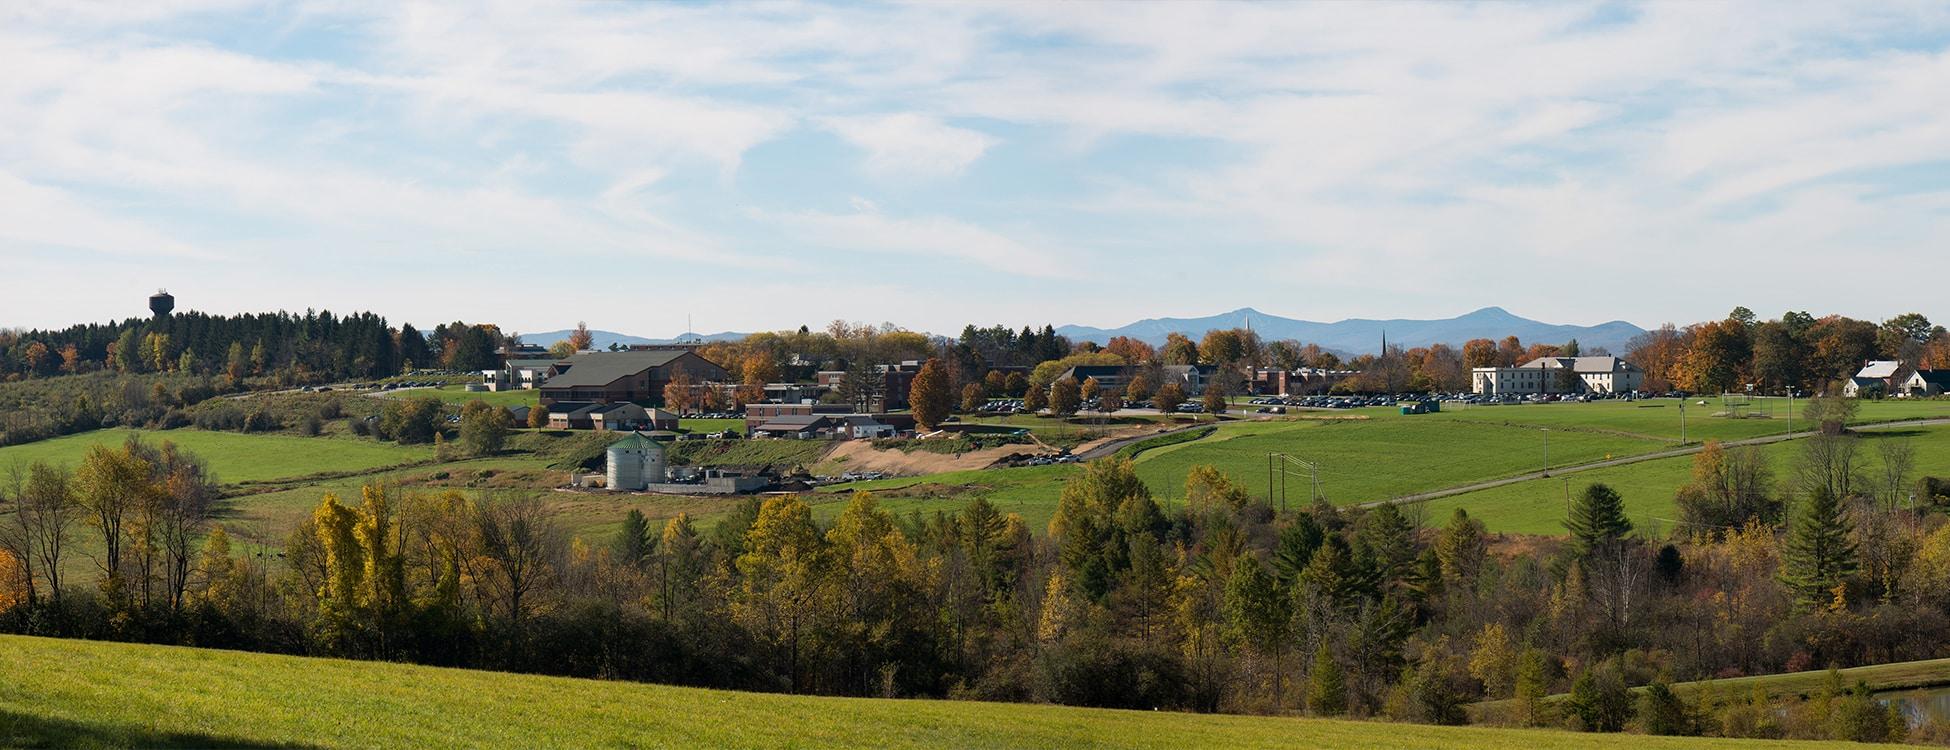 Randolph Center campus, view, digester